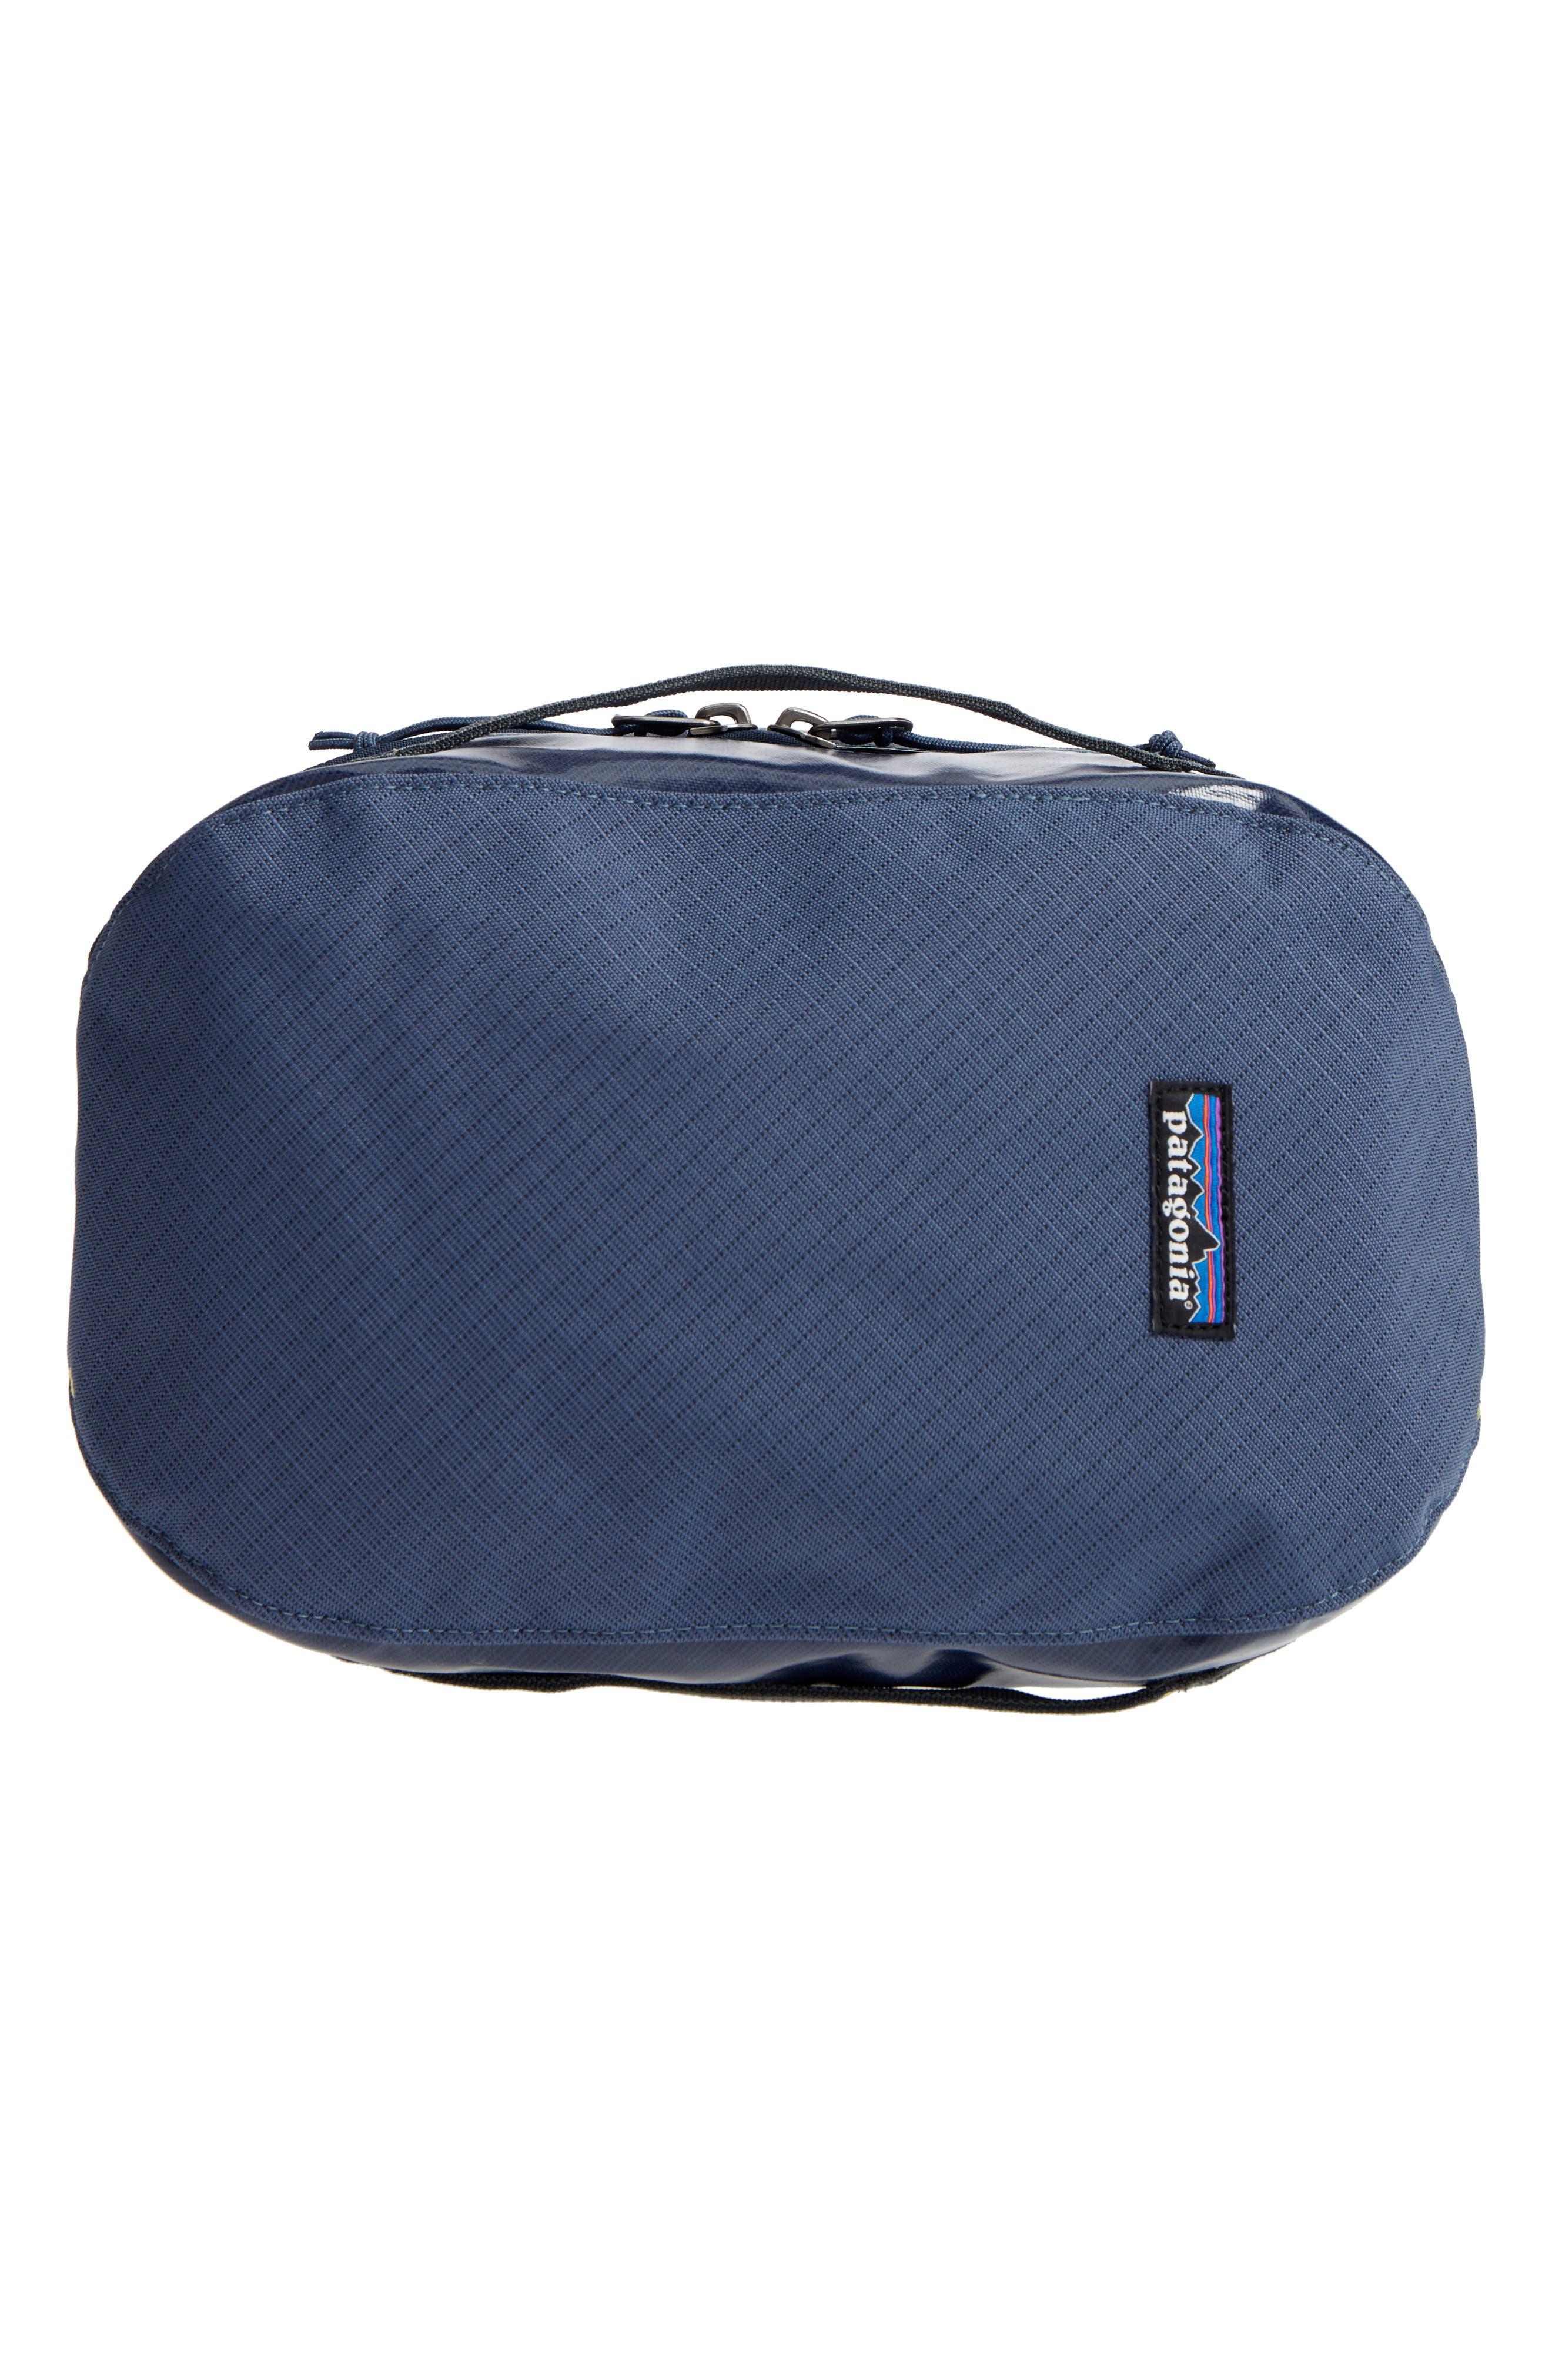 Black Hole Medium Travel Kit,                         Main,                         color, Dolomite Blue